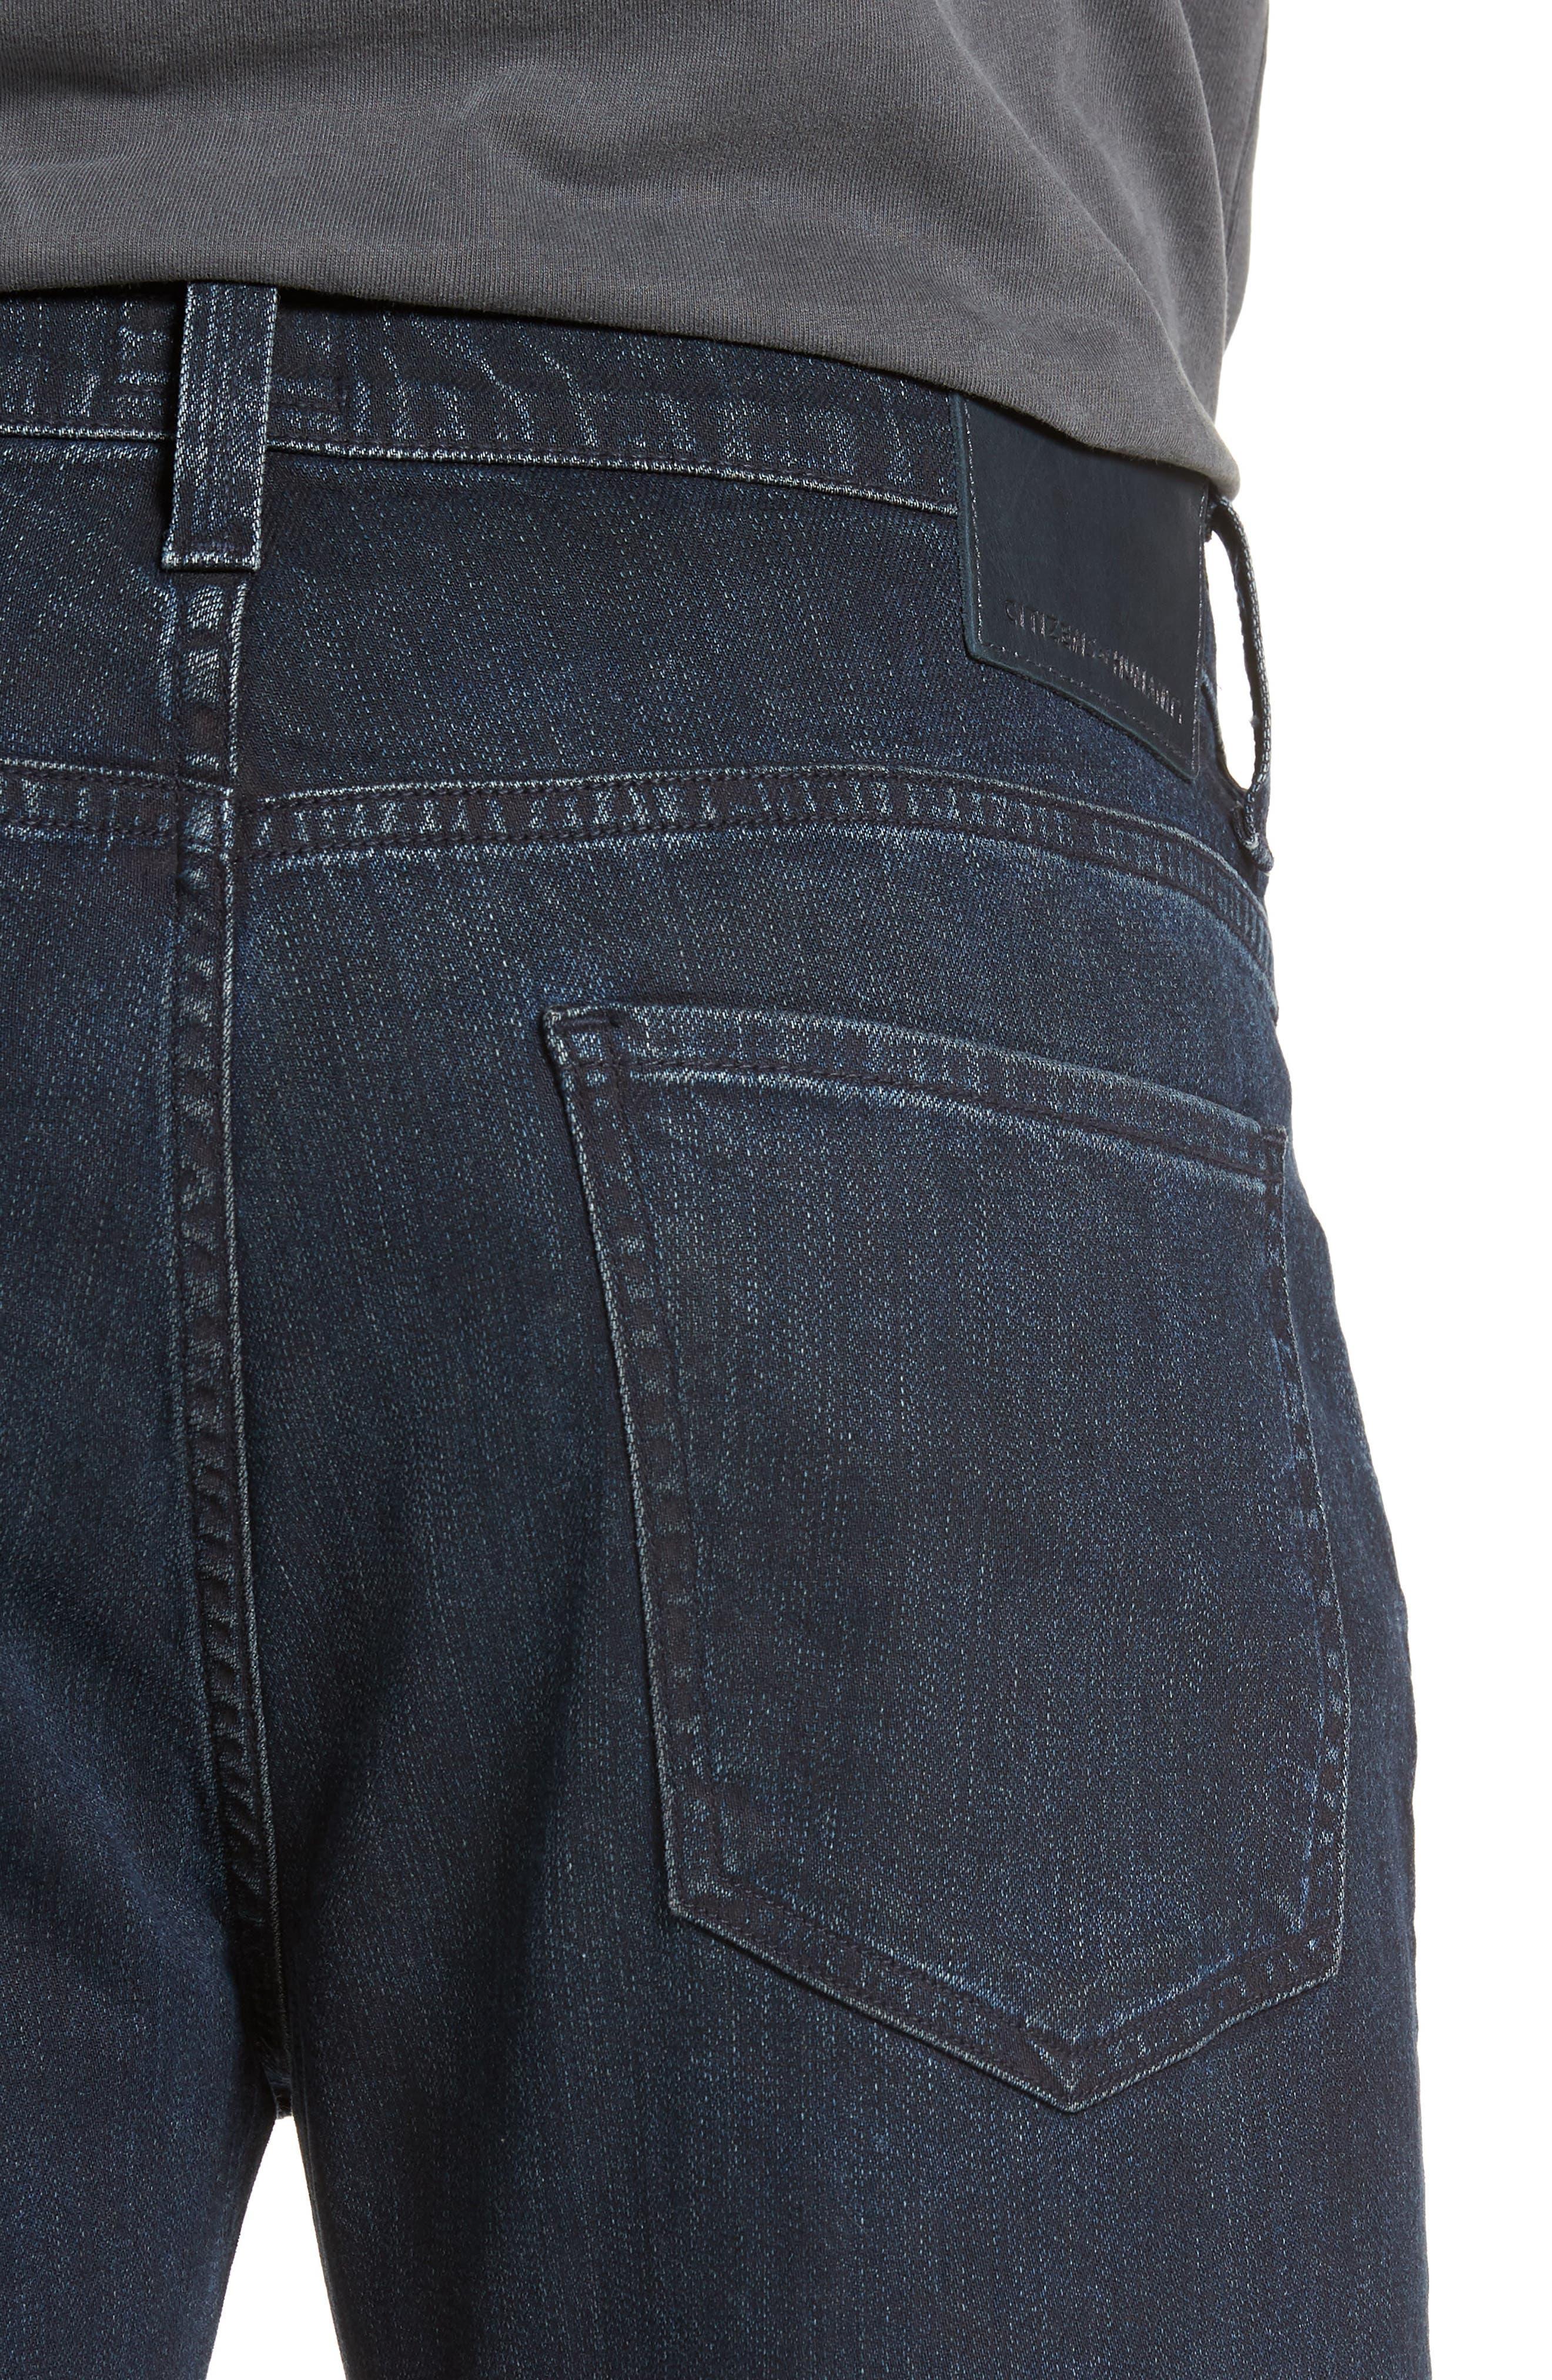 Sid Straight Leg Jeans,                             Alternate thumbnail 4, color,                             NATE